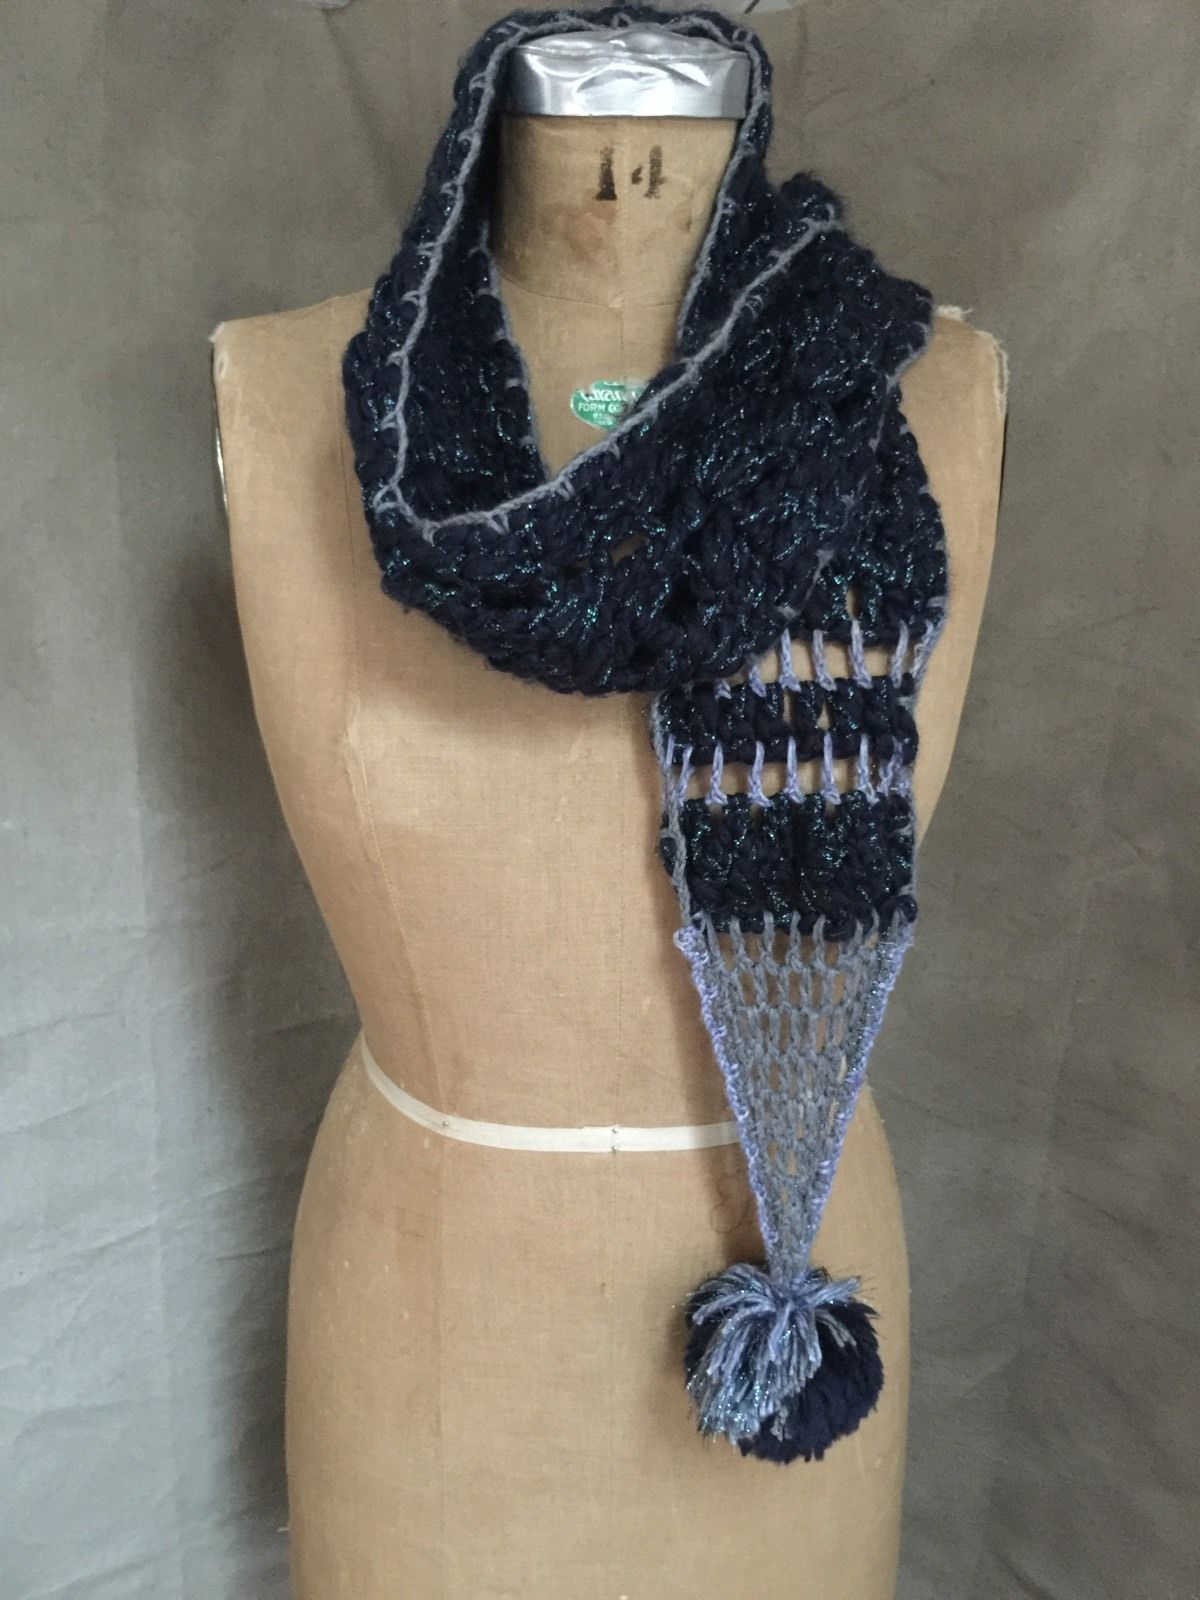 Free People NEW Blue Silver Yarn CROCHET POMPOM Winter Neck Scarf GIFT rn#66170